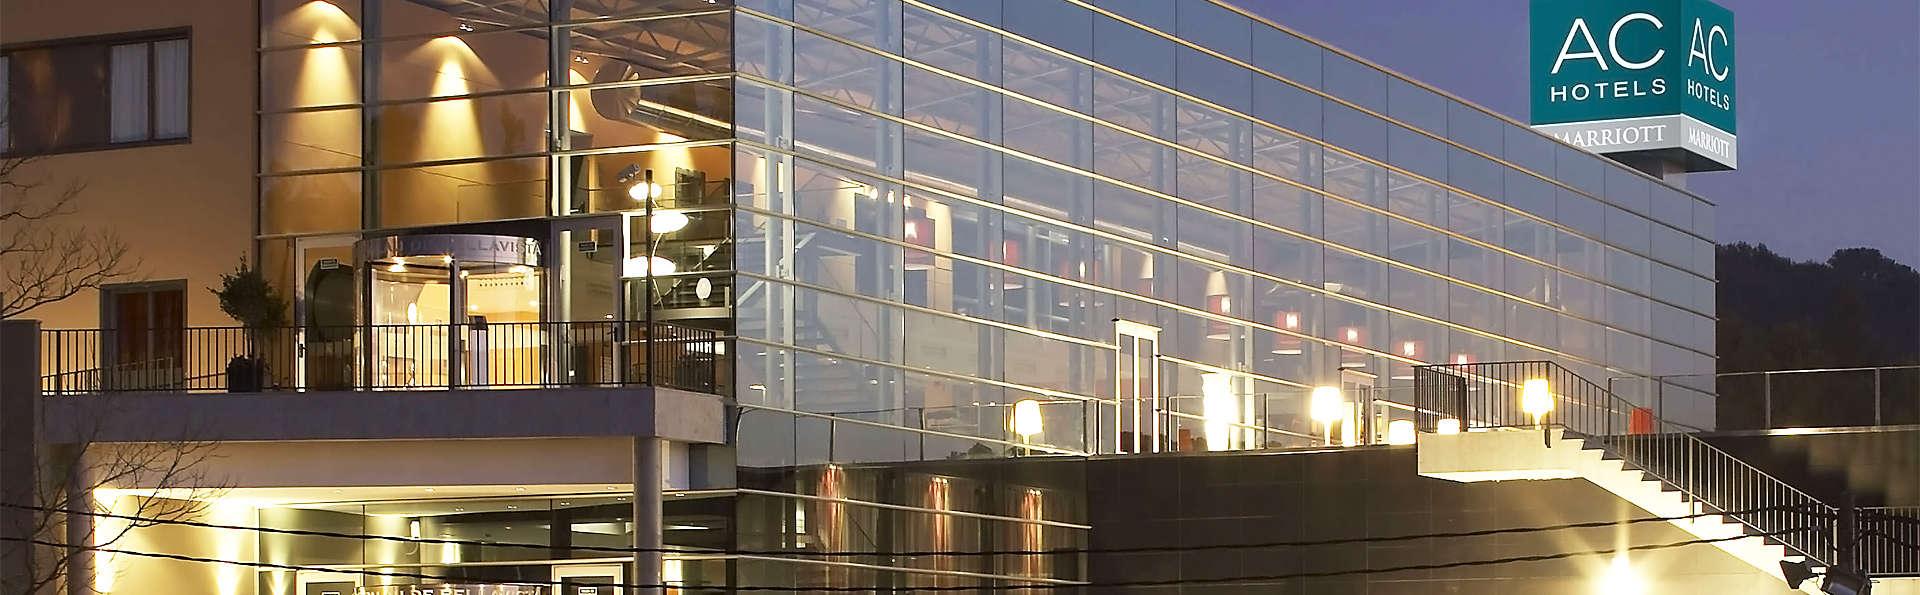 AC Hotel Palau de Bellavista Girona - EDIT_facade.jpg